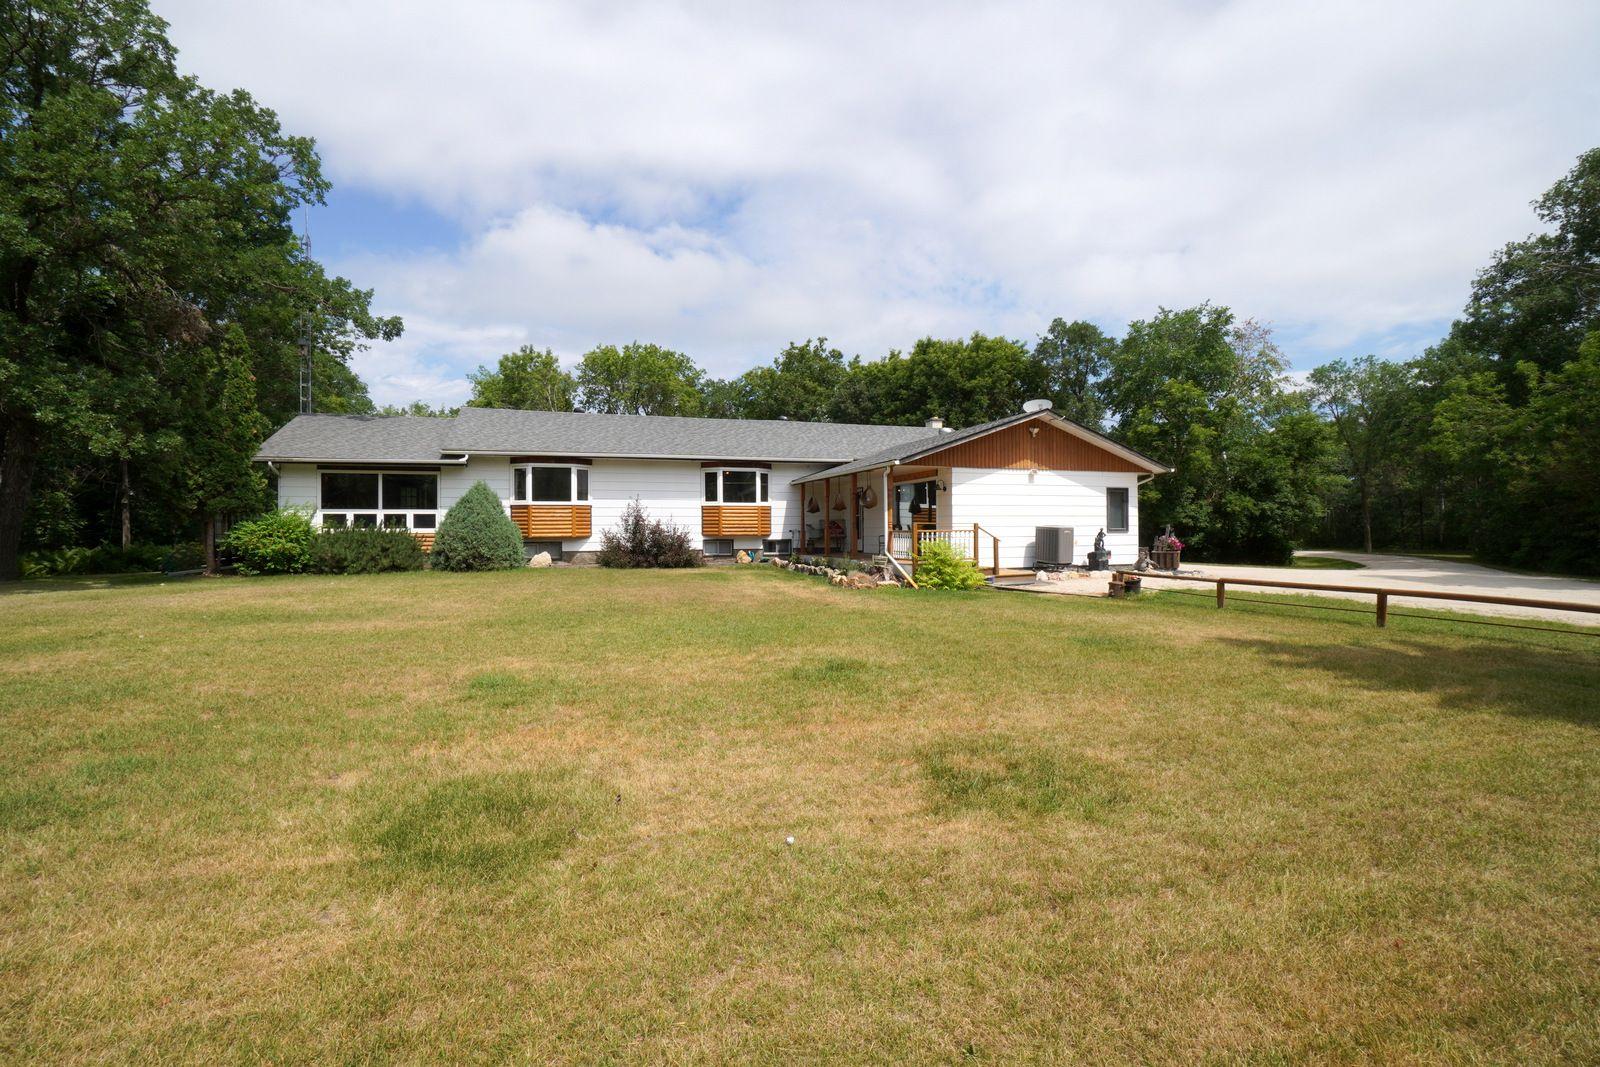 Main Photo: 39066 Road 64 N in Portage la Prairie RM: House for sale : MLS®# 202116718